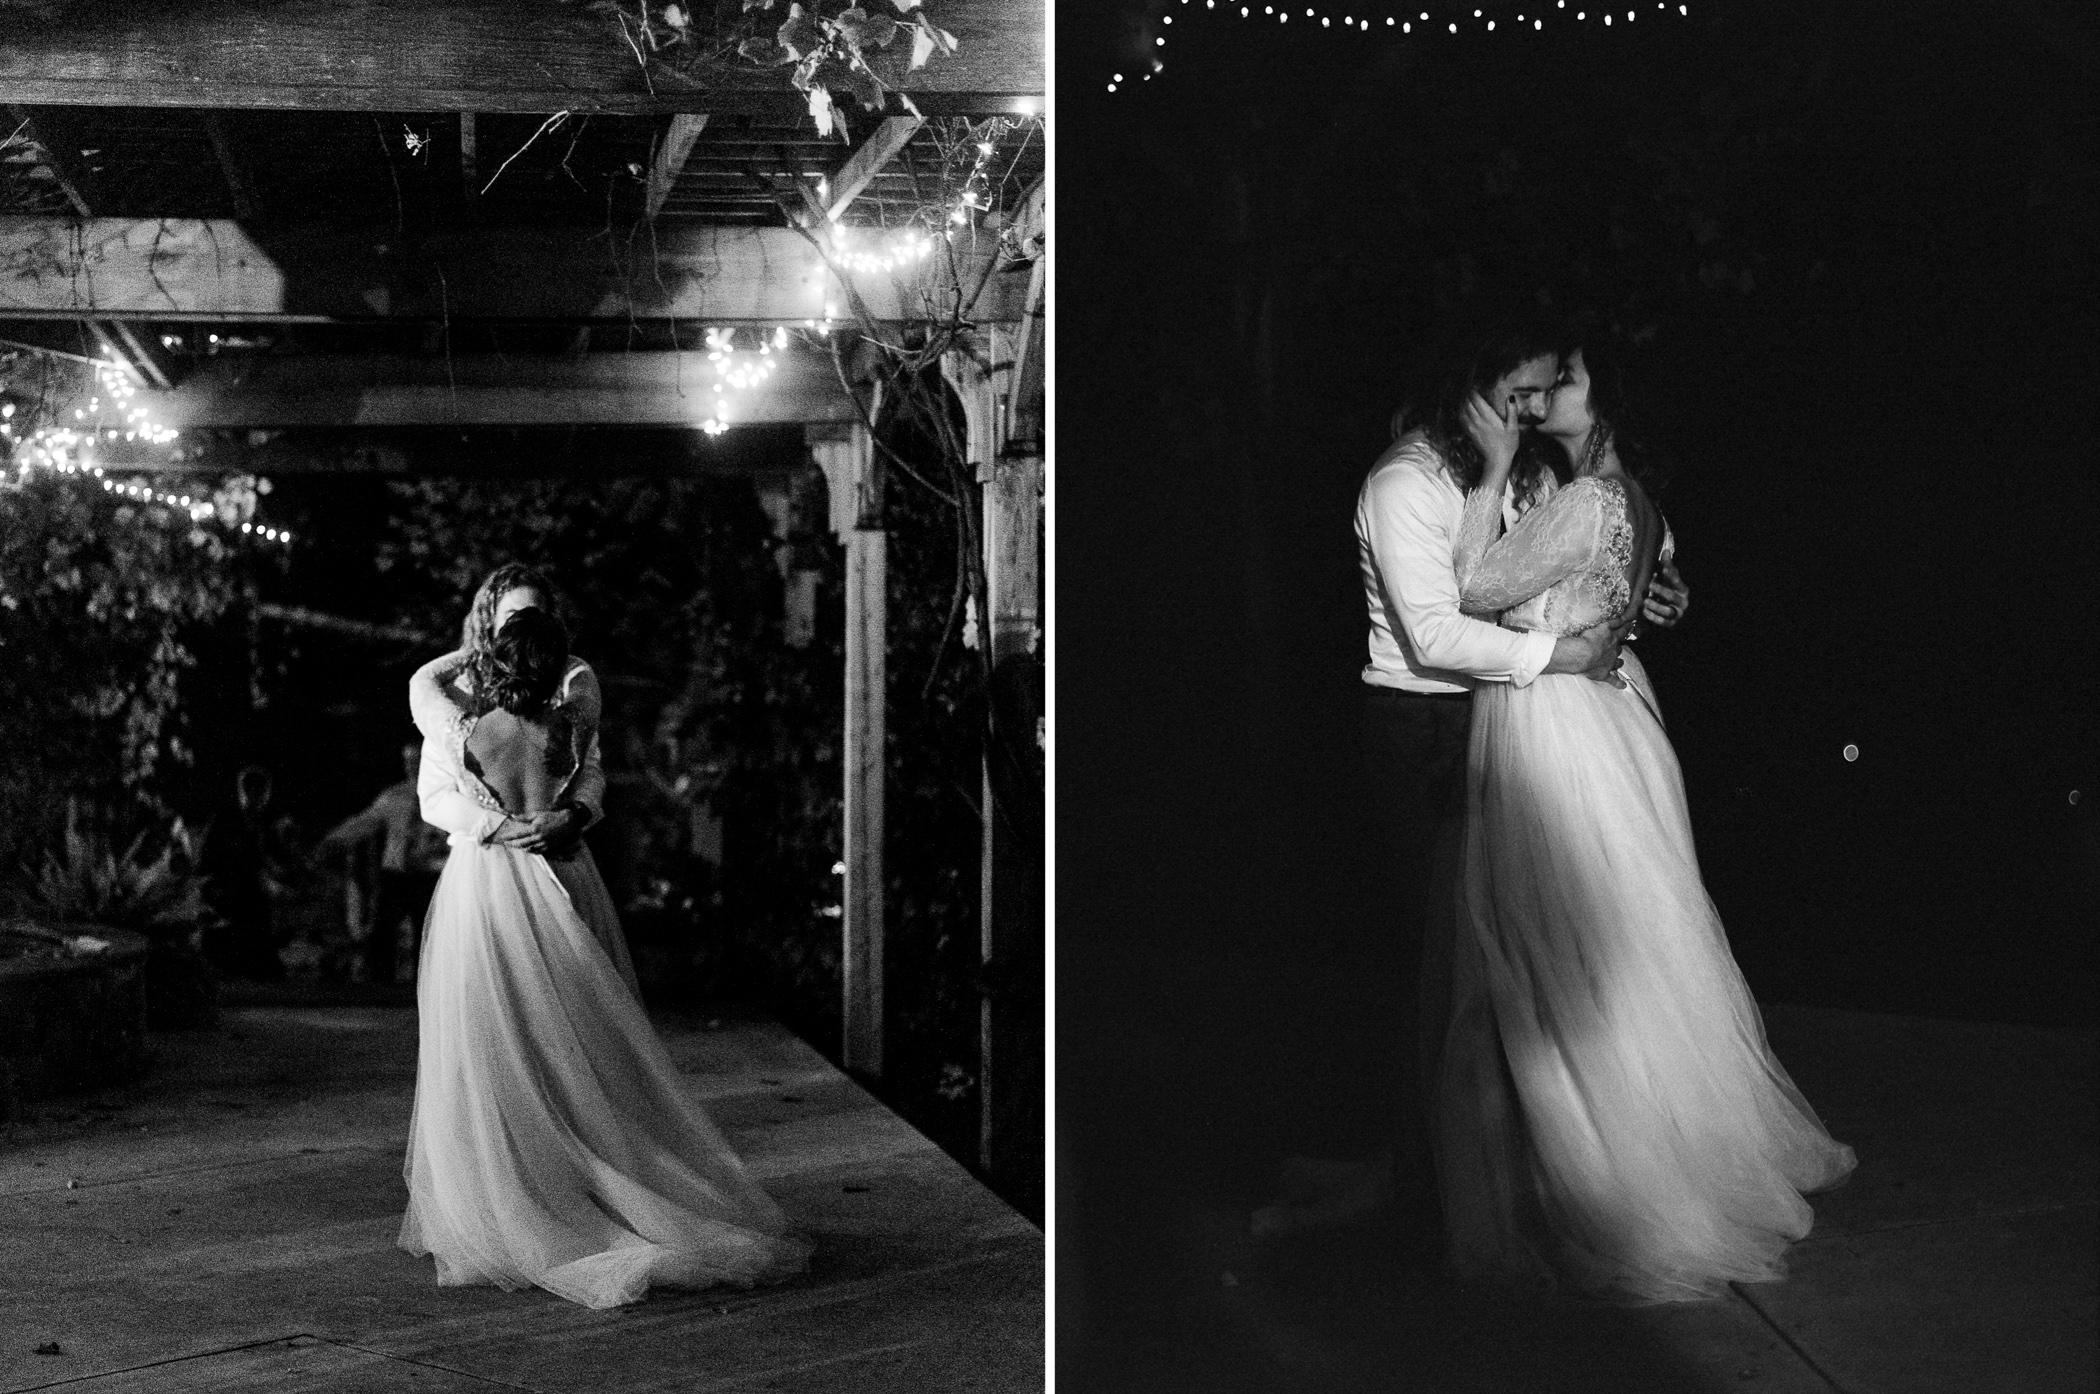 Charlotte-Film-Wedding_Photographer-heartstone-lodge-virginia-54.jpg